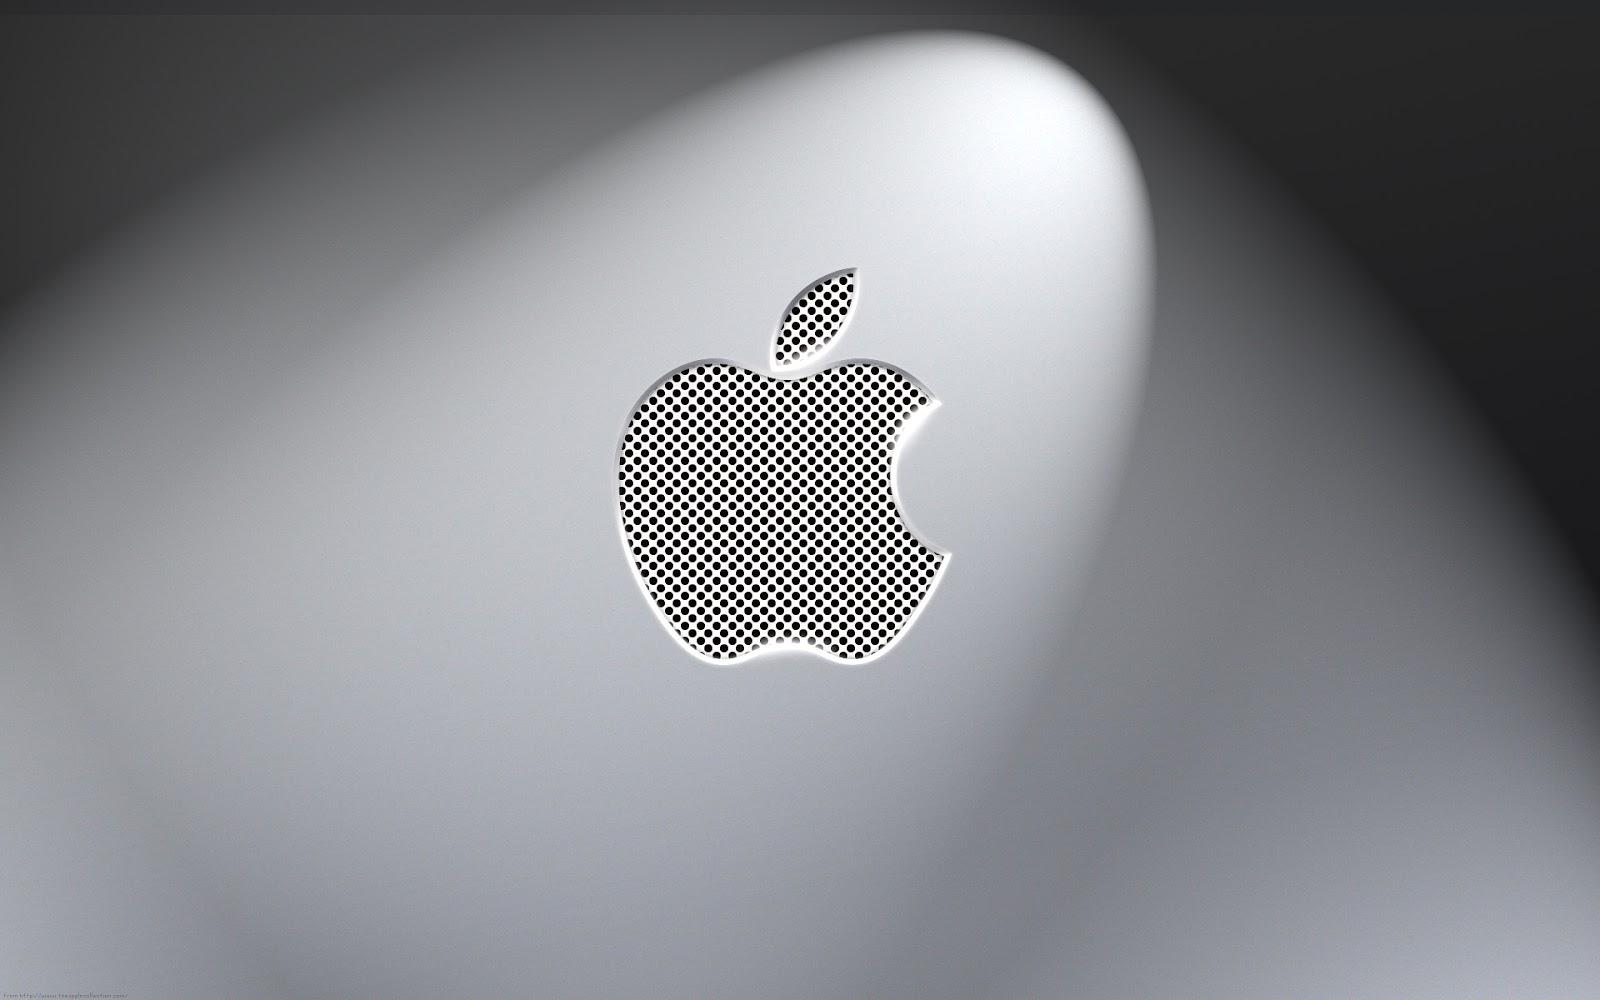 apple wallpaper cu - photo #28